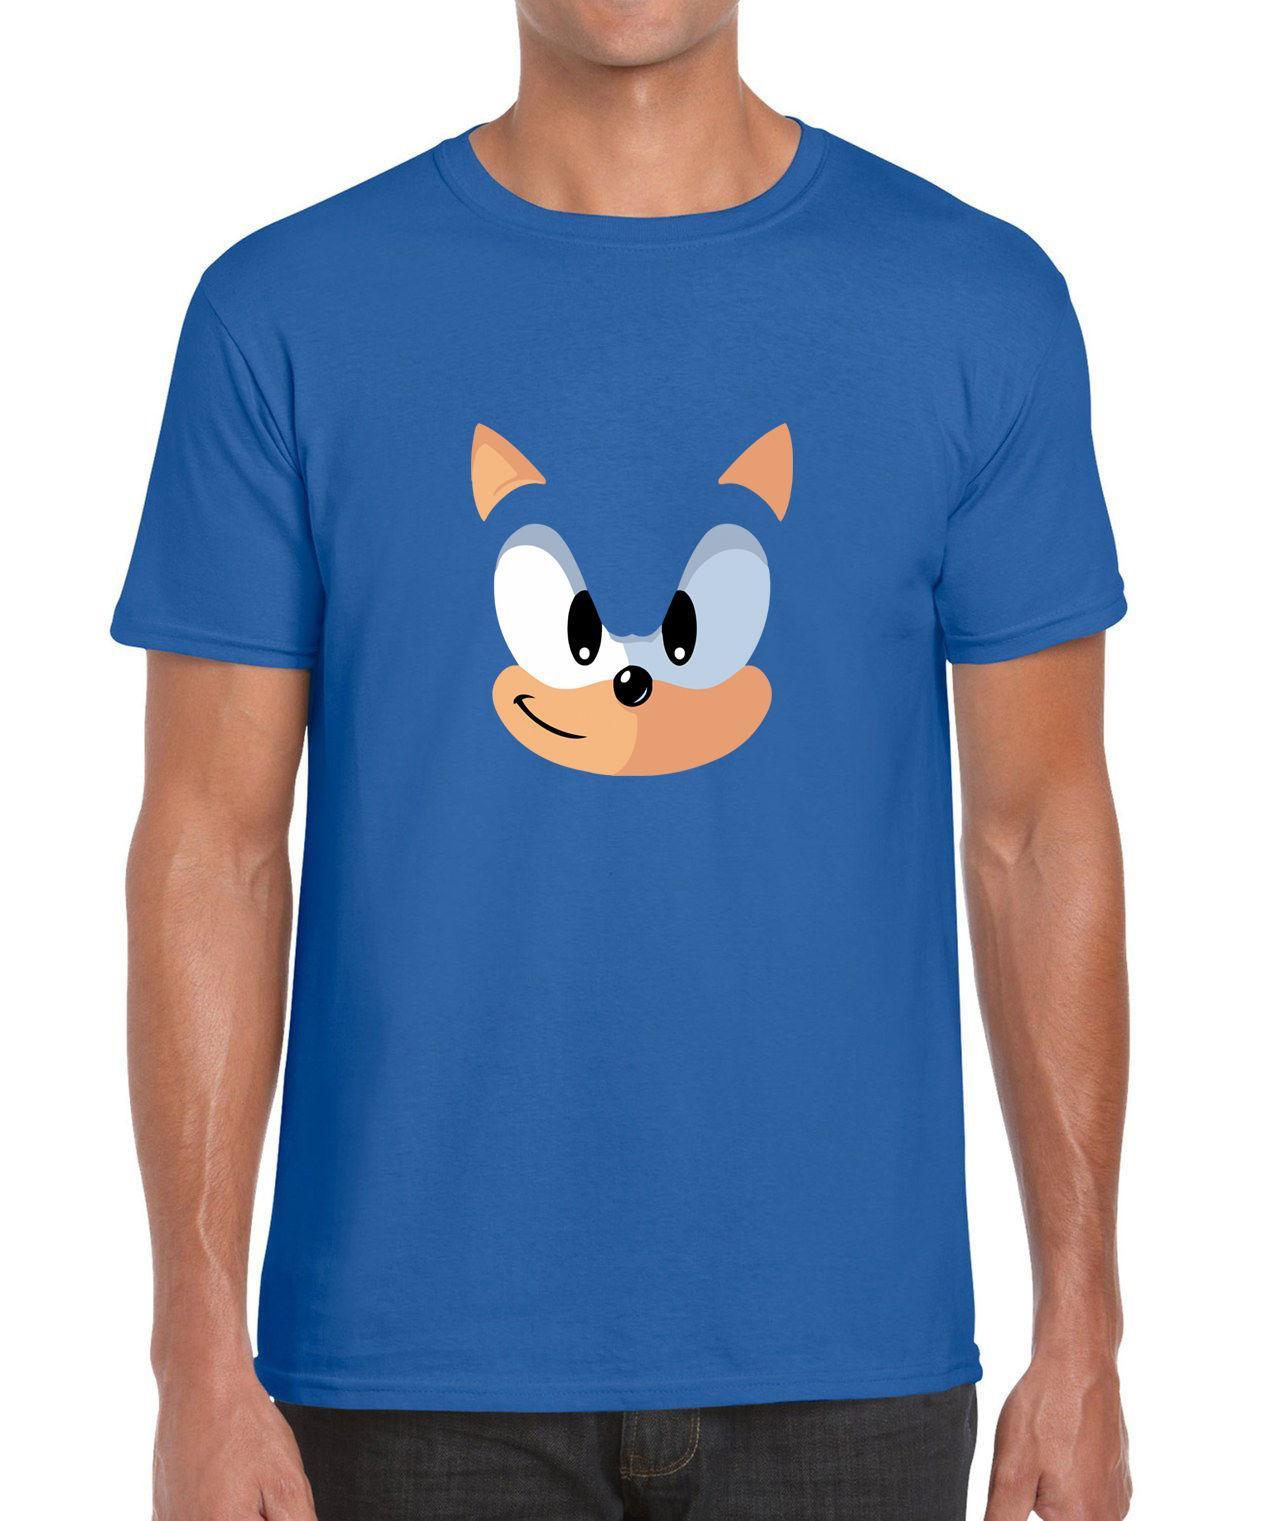 Grosshandel Sonic The Hedgehog Blue Face Videospiel Parodie Vintage